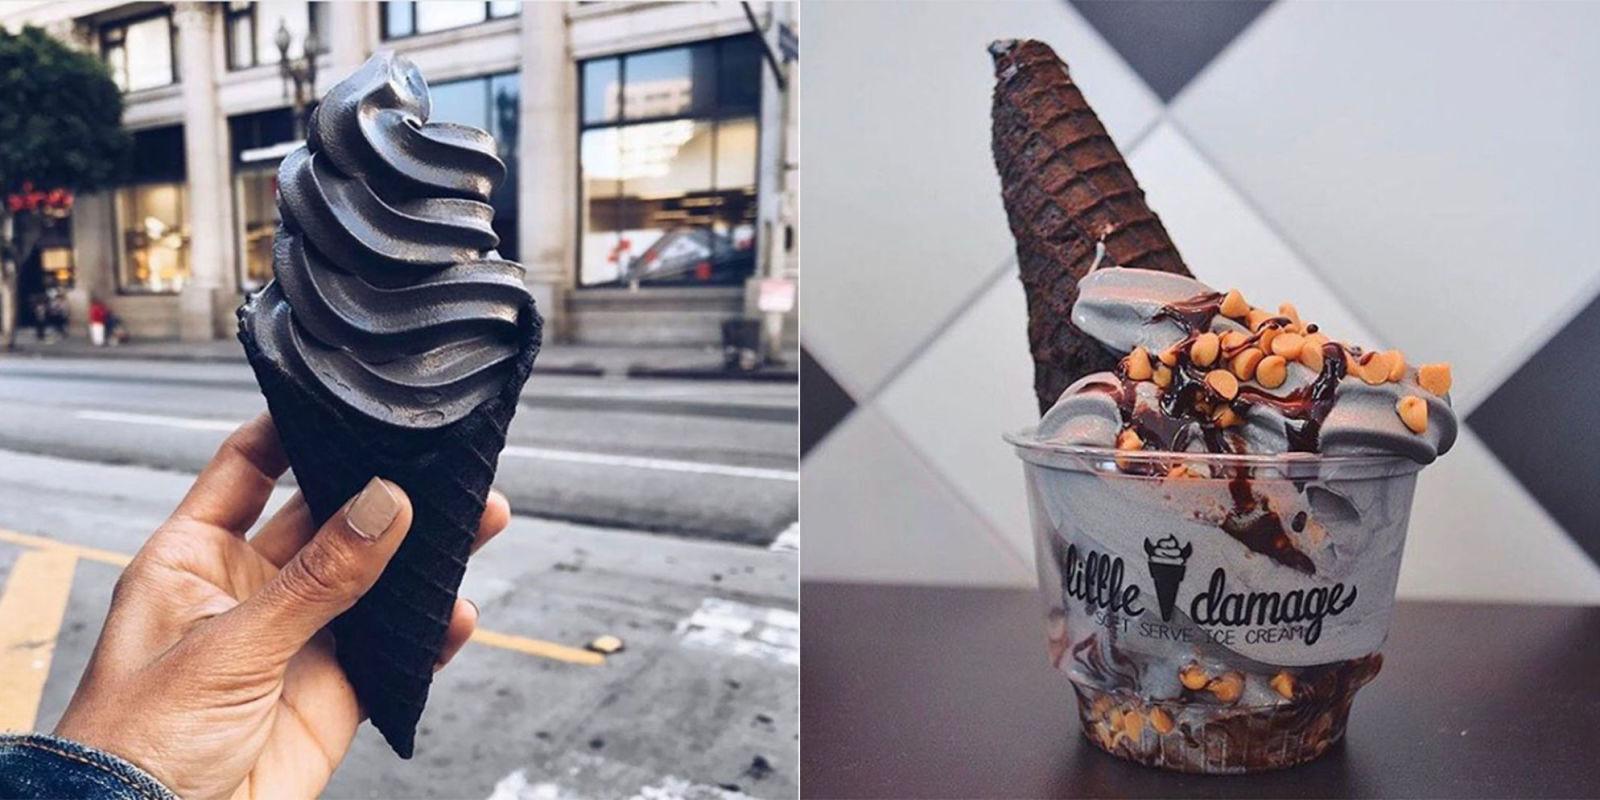 Little Damage Ice Cream In La Serves Black Ice Cream From